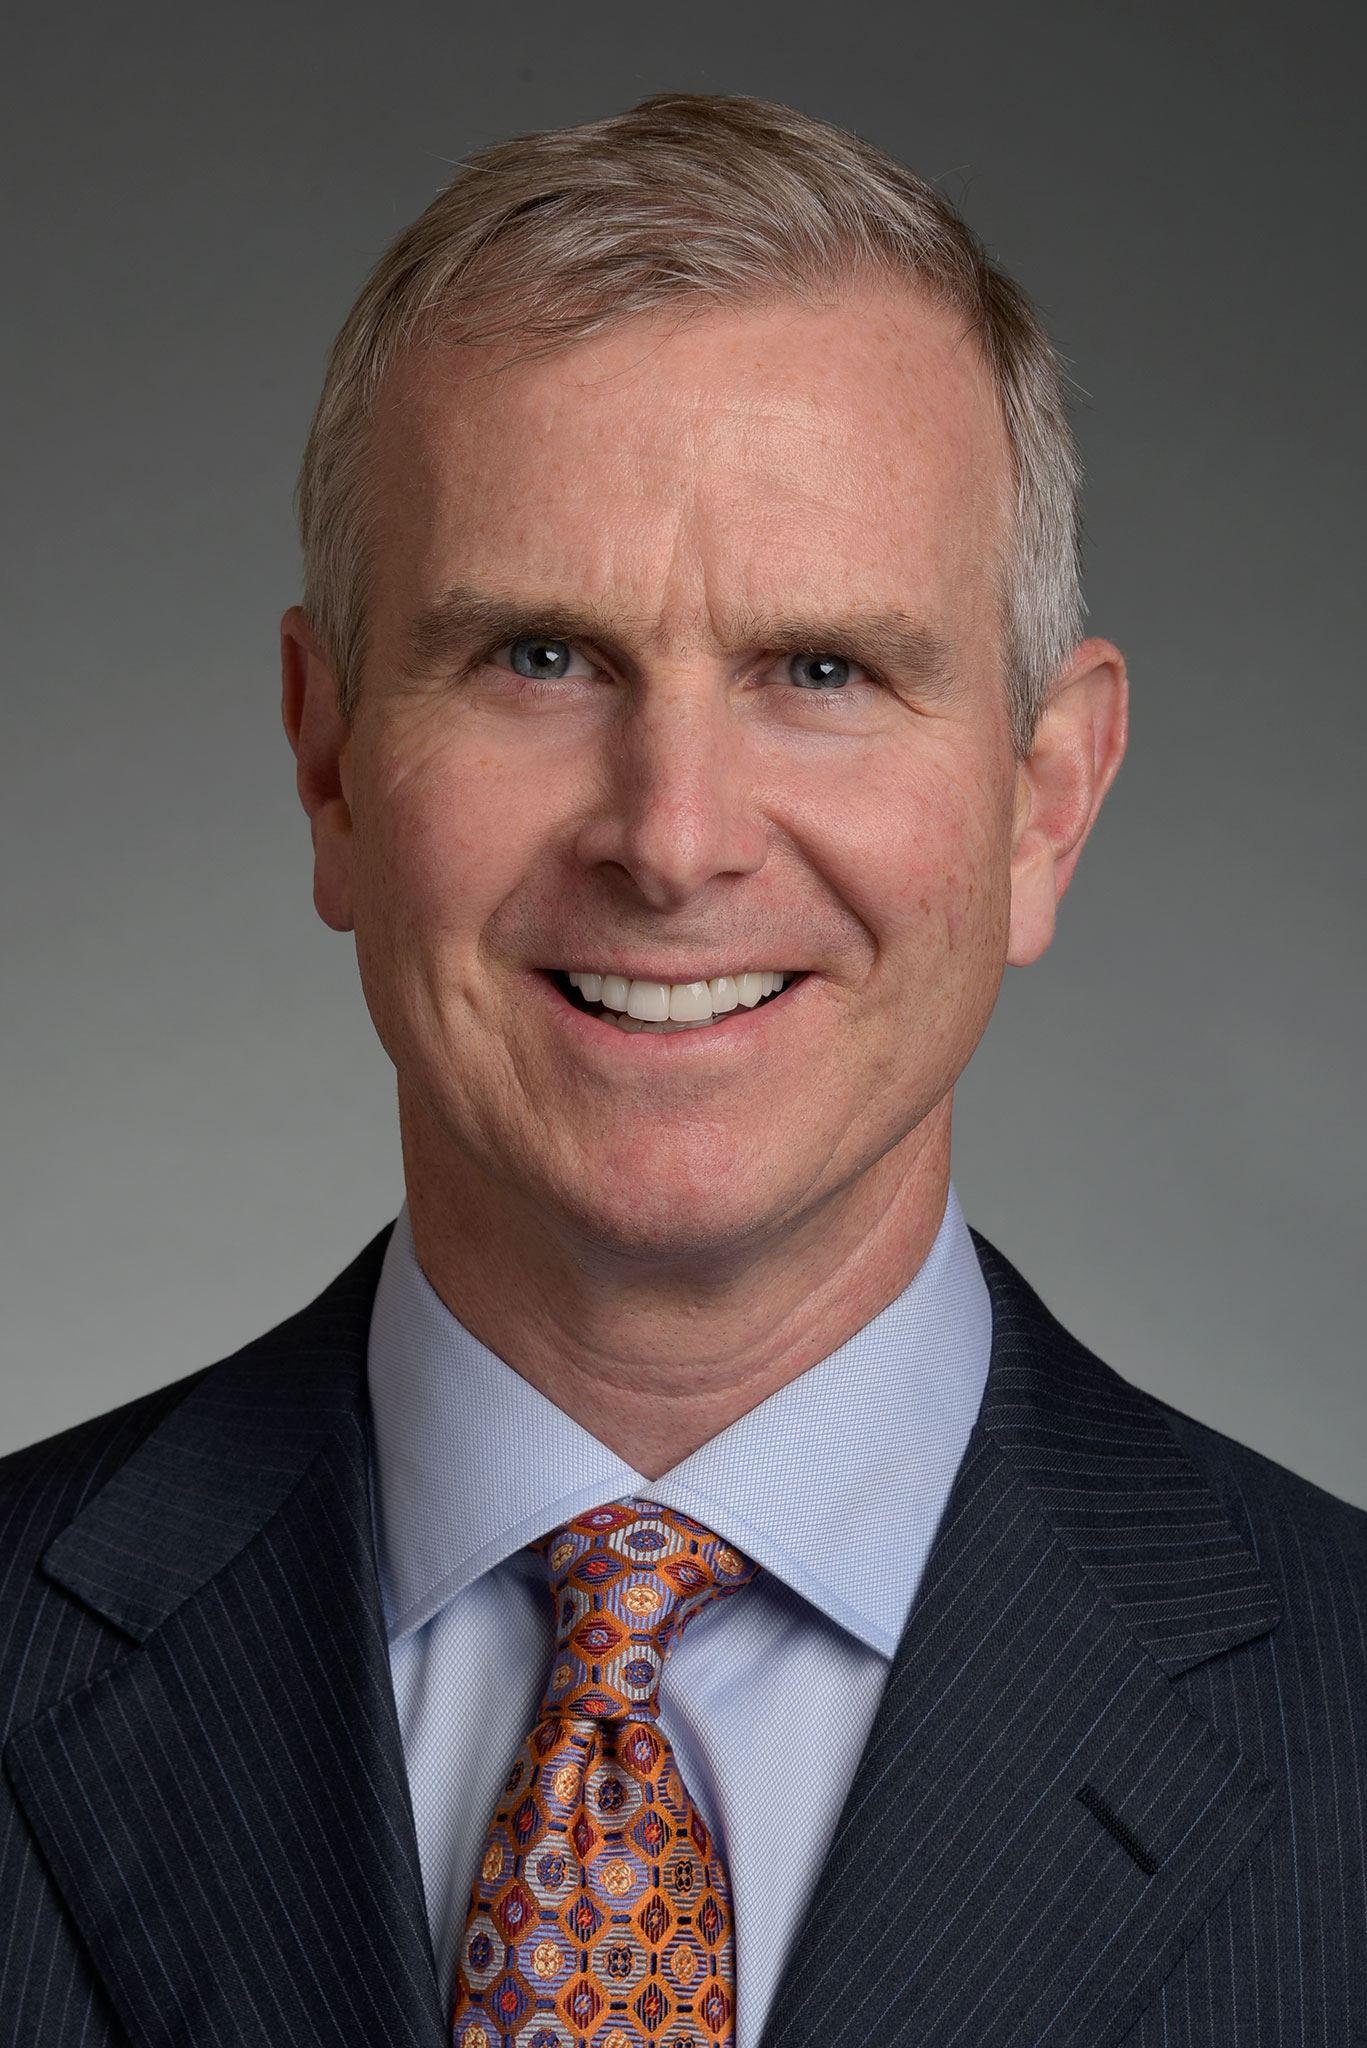 Brian S. Shaffer, MD